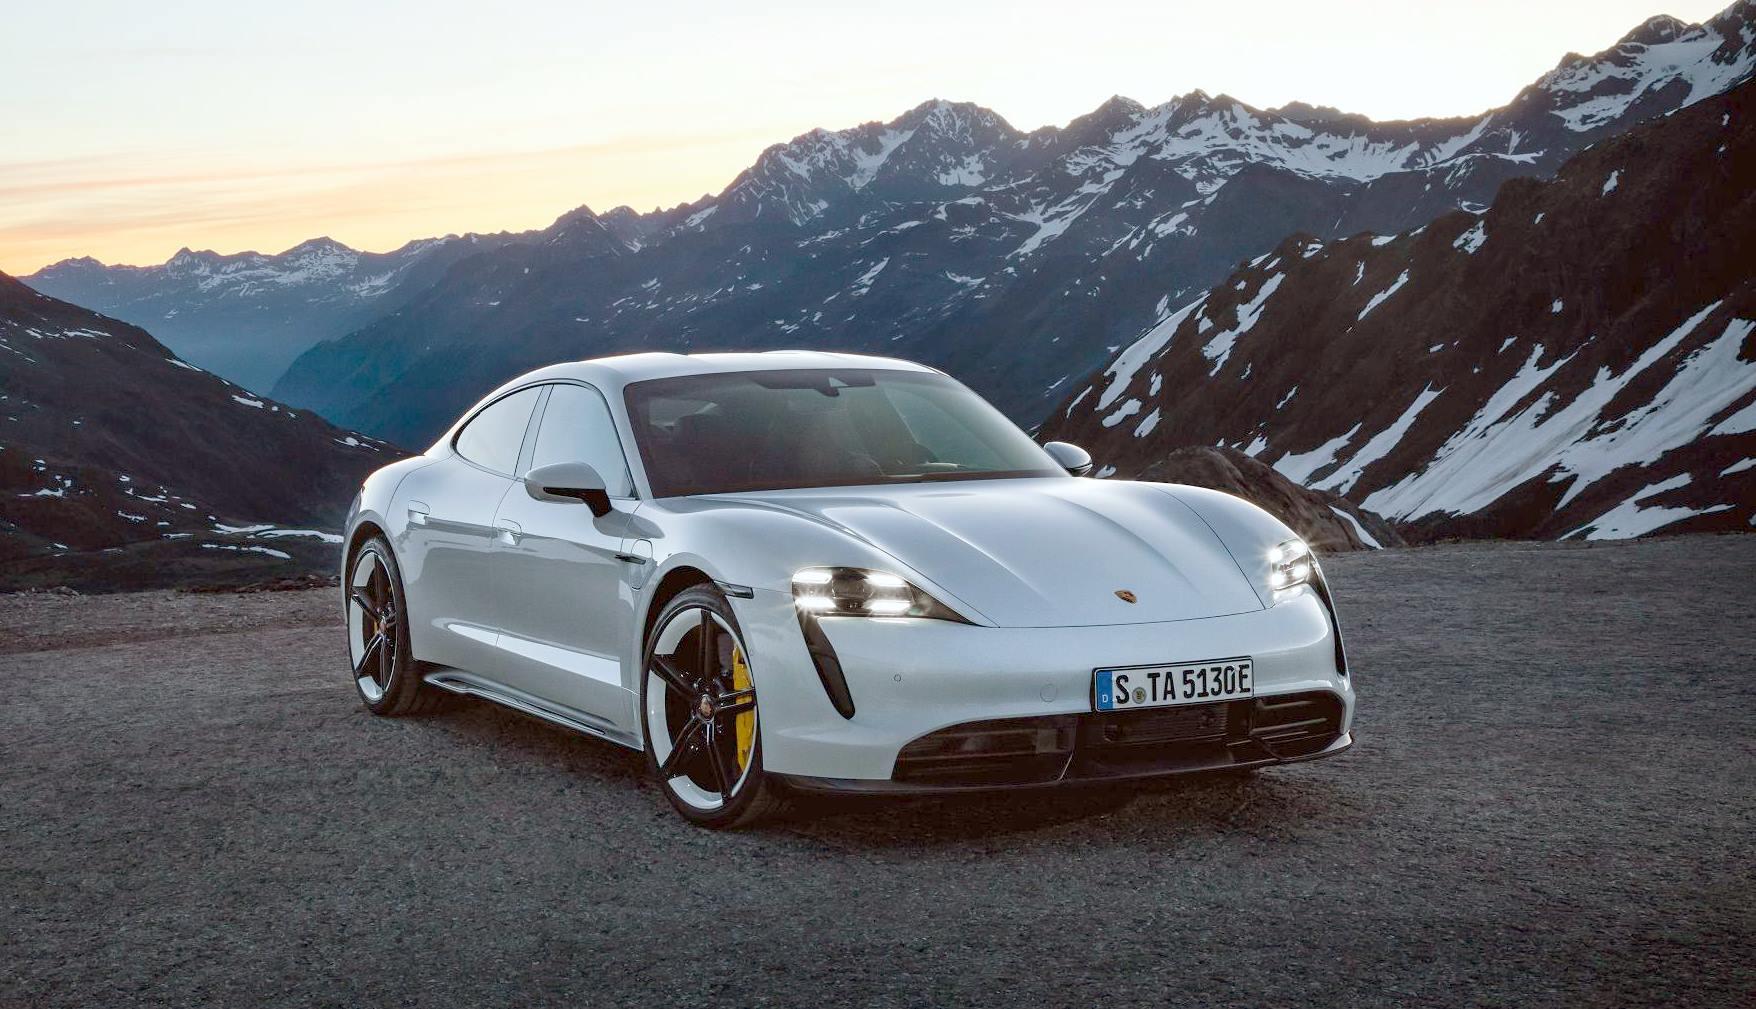 Porsche Taycan Press Image